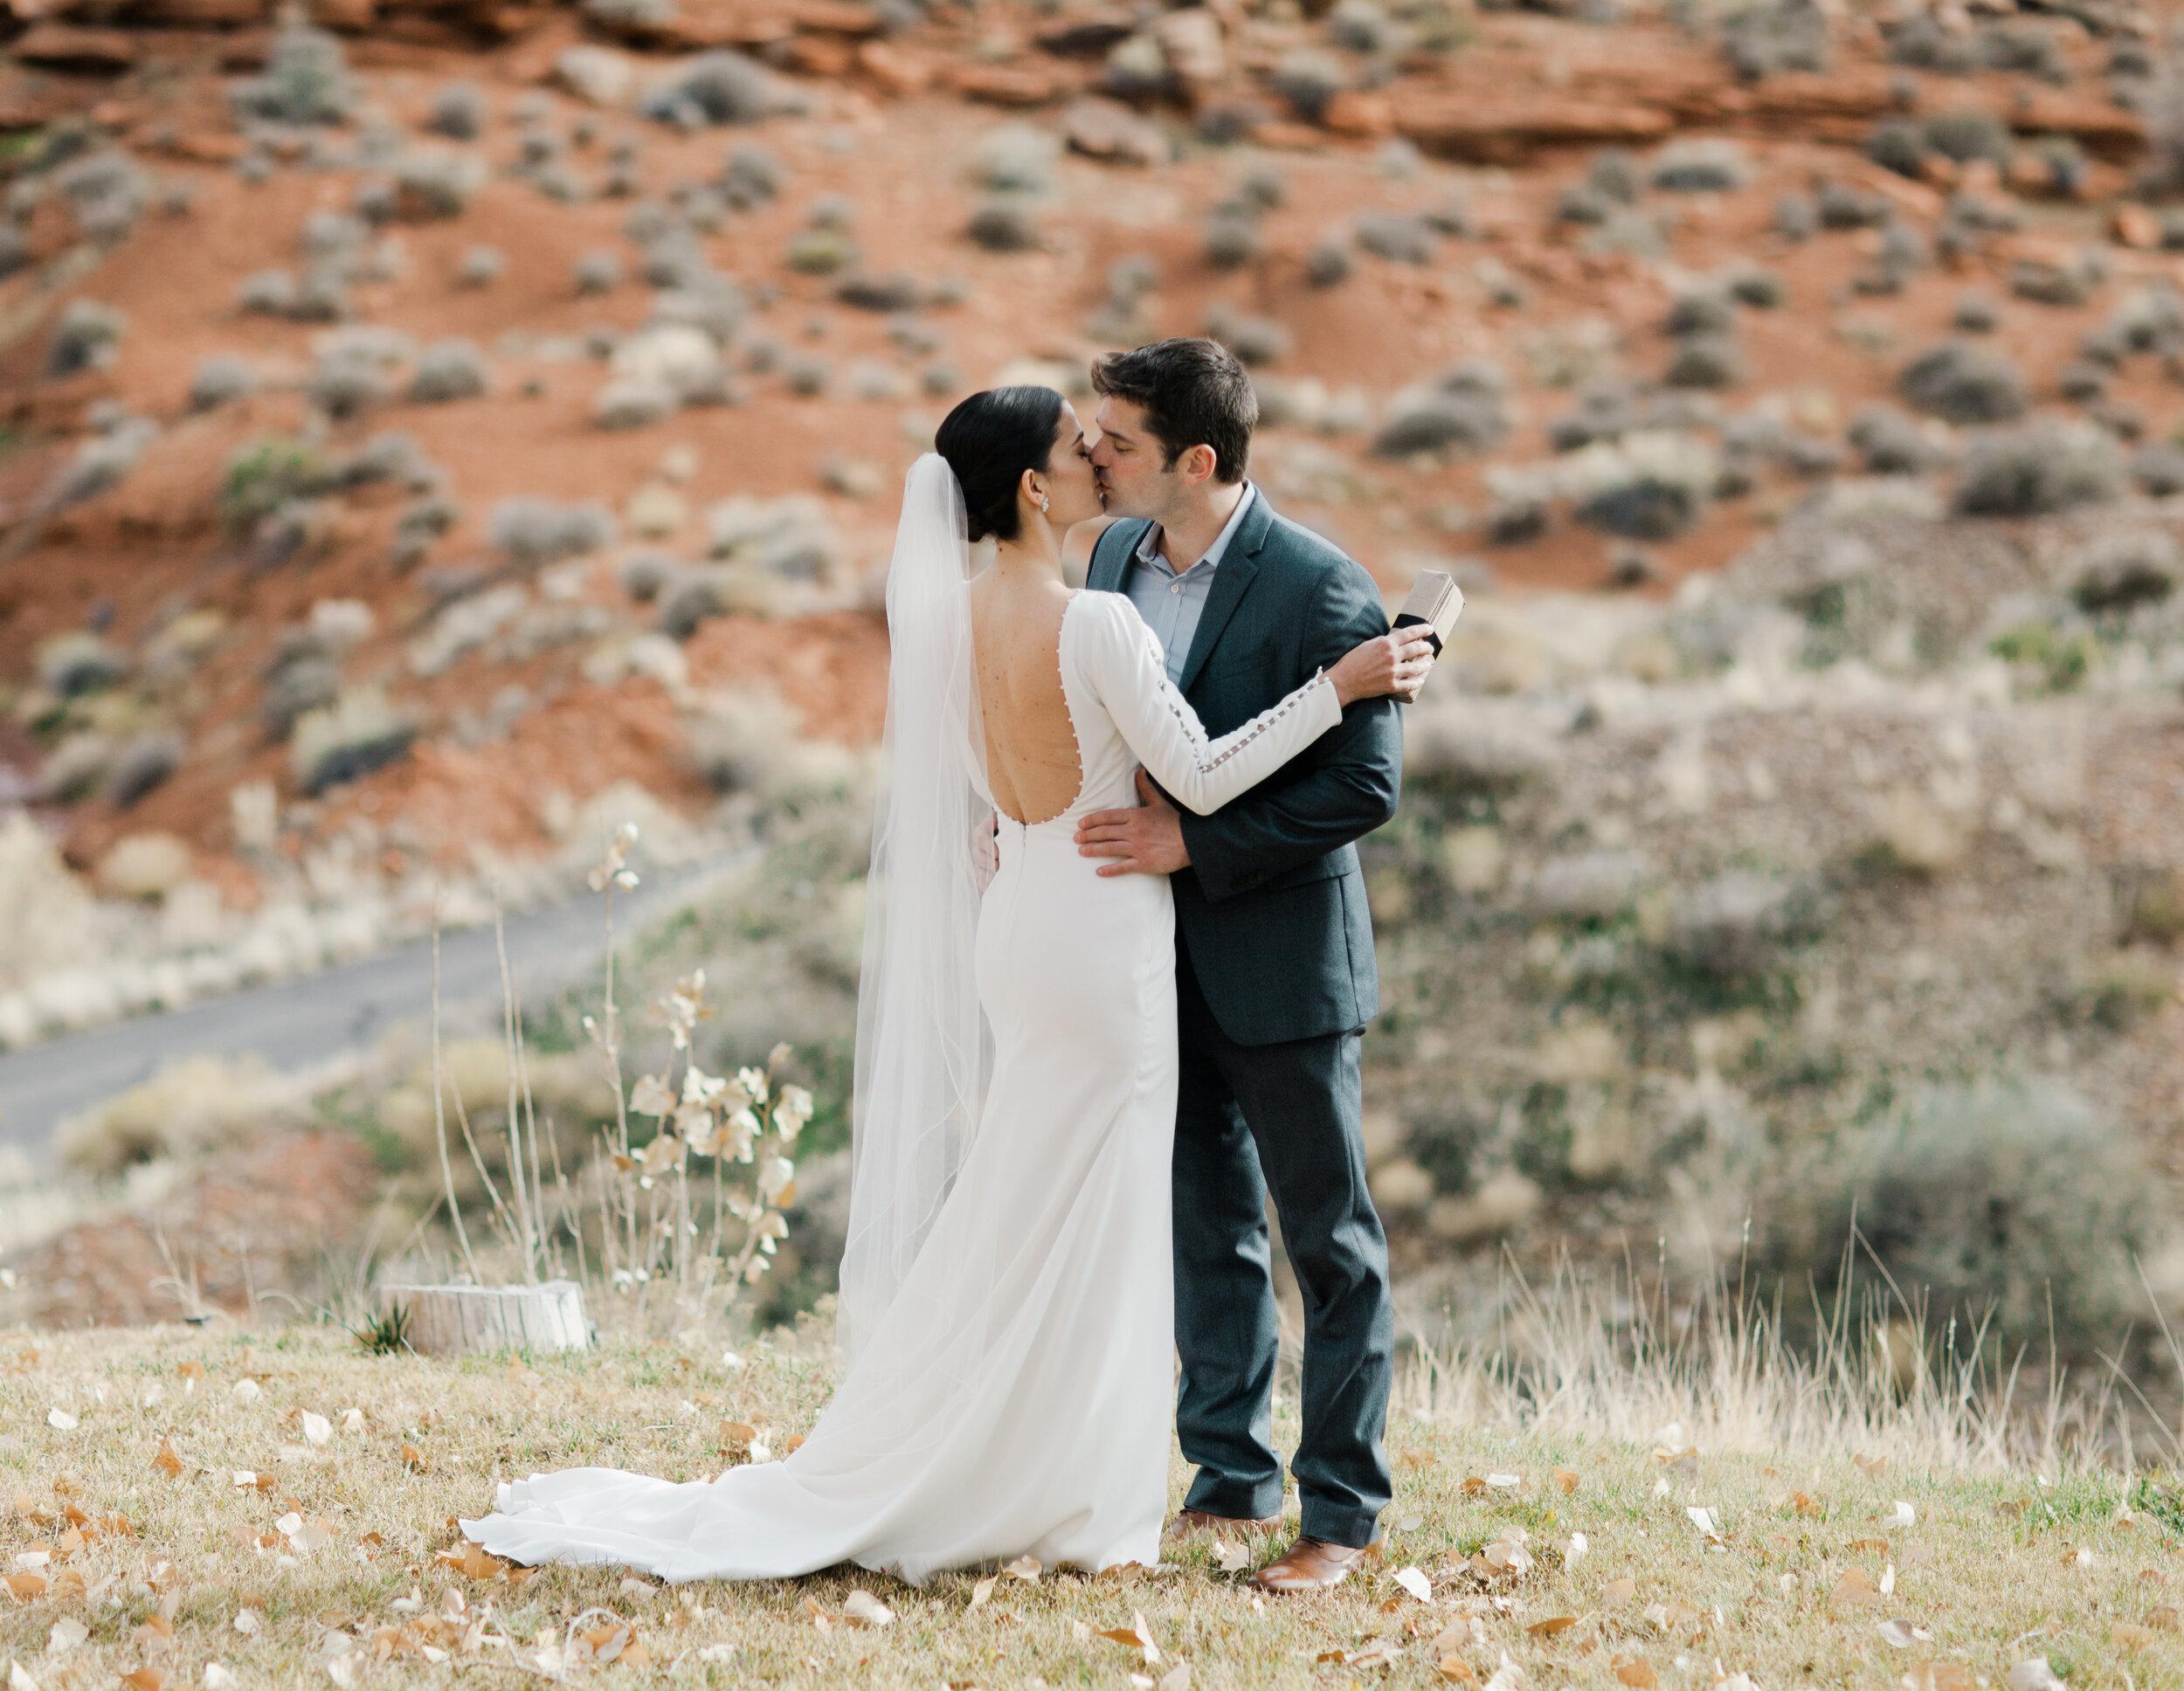 Victoria and Zach Sorrel River Ranch Wedding 030.jpg